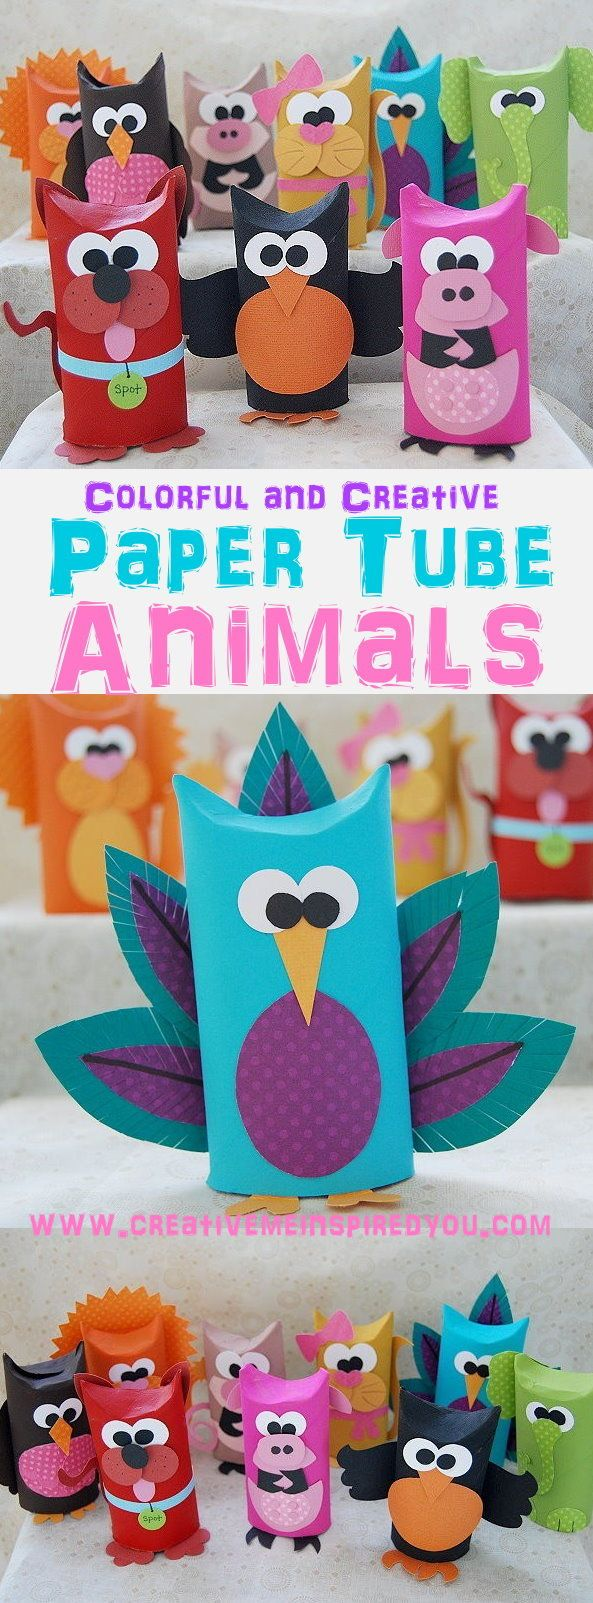 DIY Toilet Tube Animals